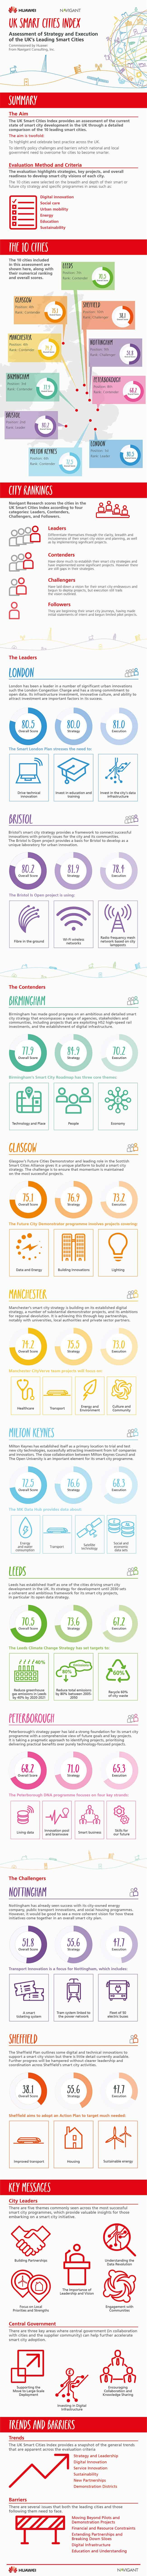 Huawei-Smart-Cities-Infographic_FULL